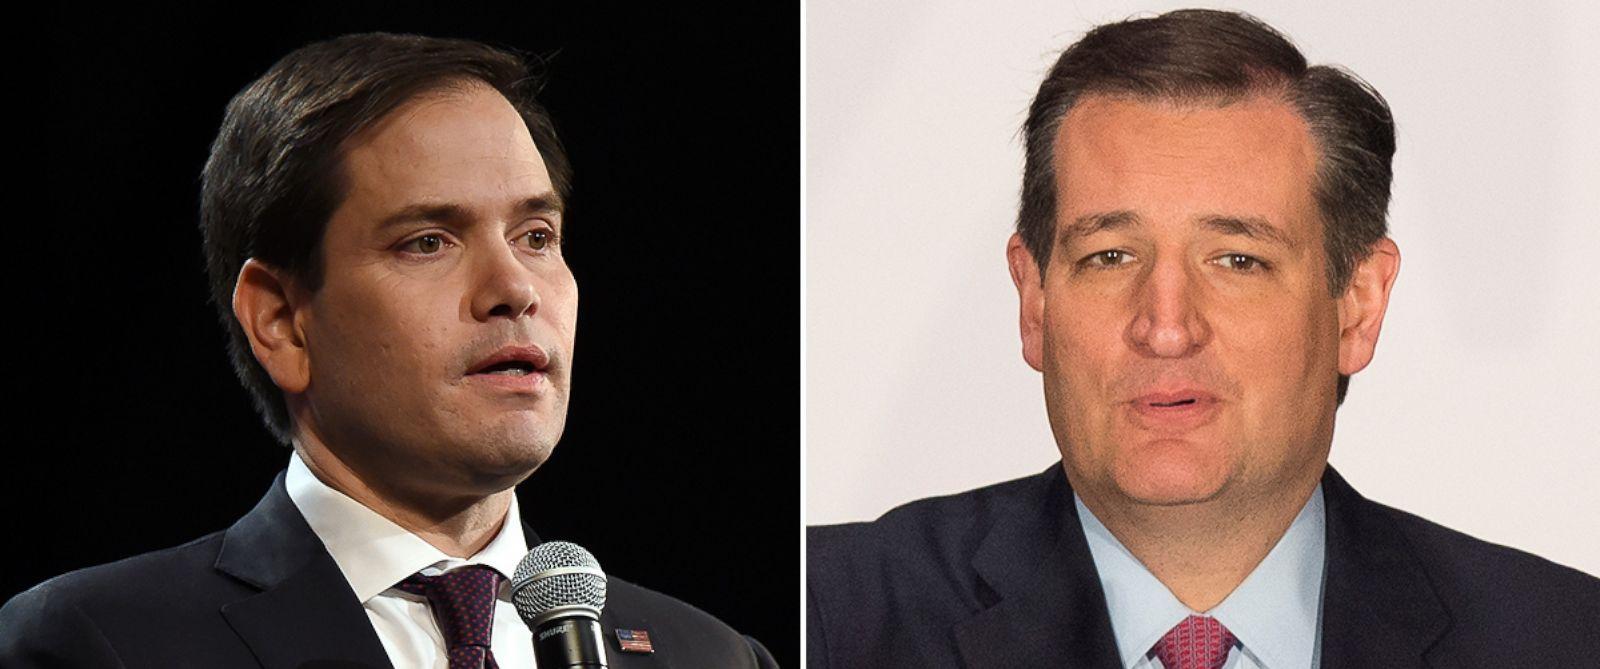 PHOTO: Sen. Marco Rubio and Sen. Ted Cruz.